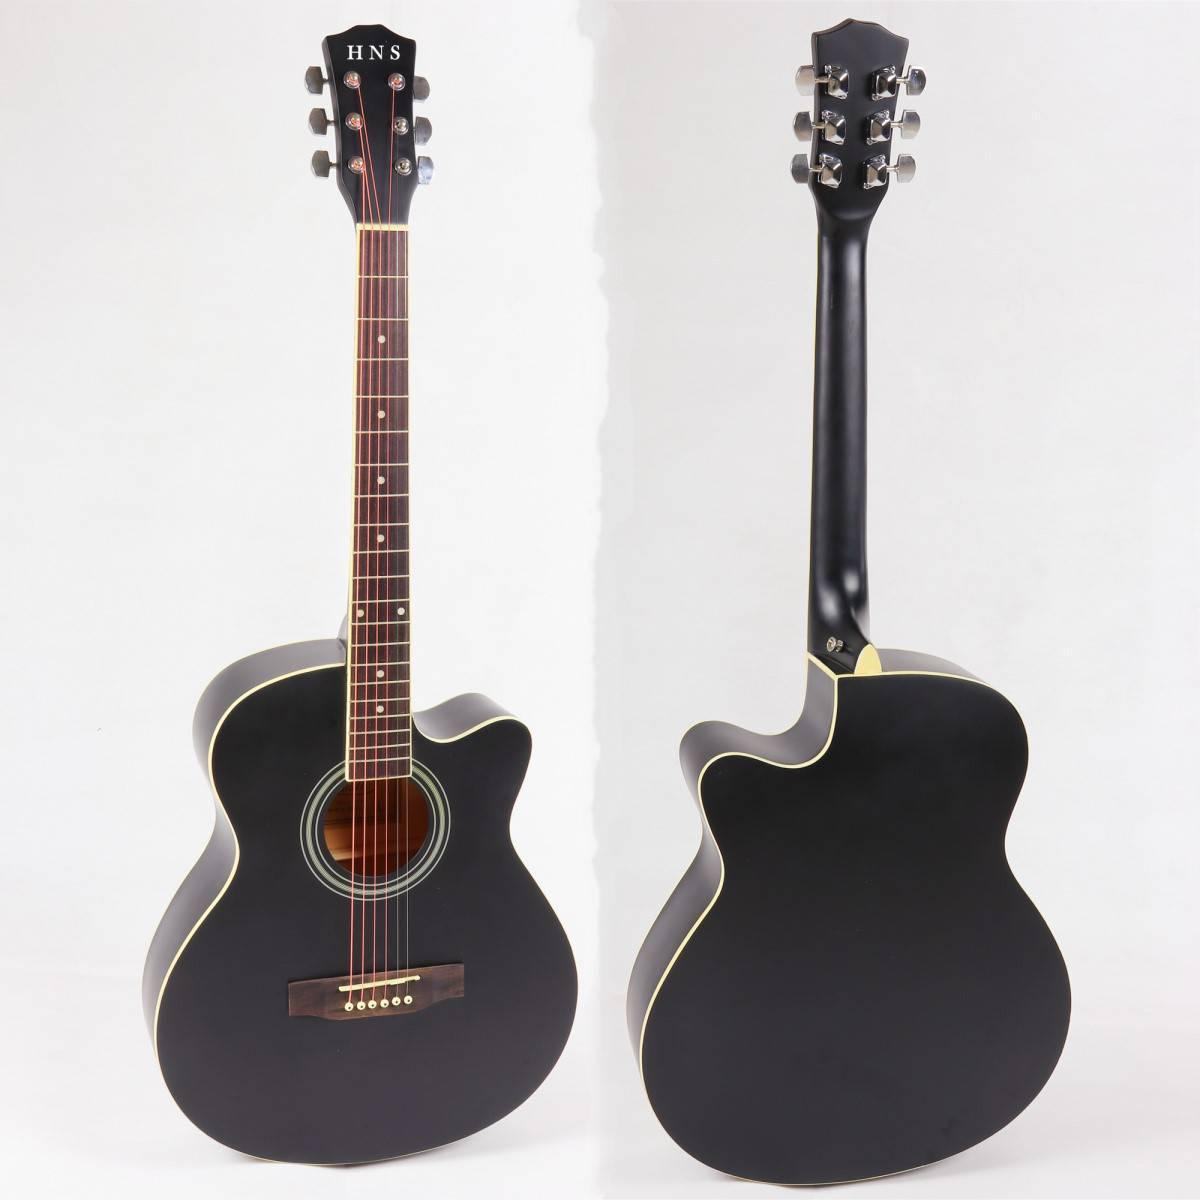 40 inch acoustic guitar for beginner